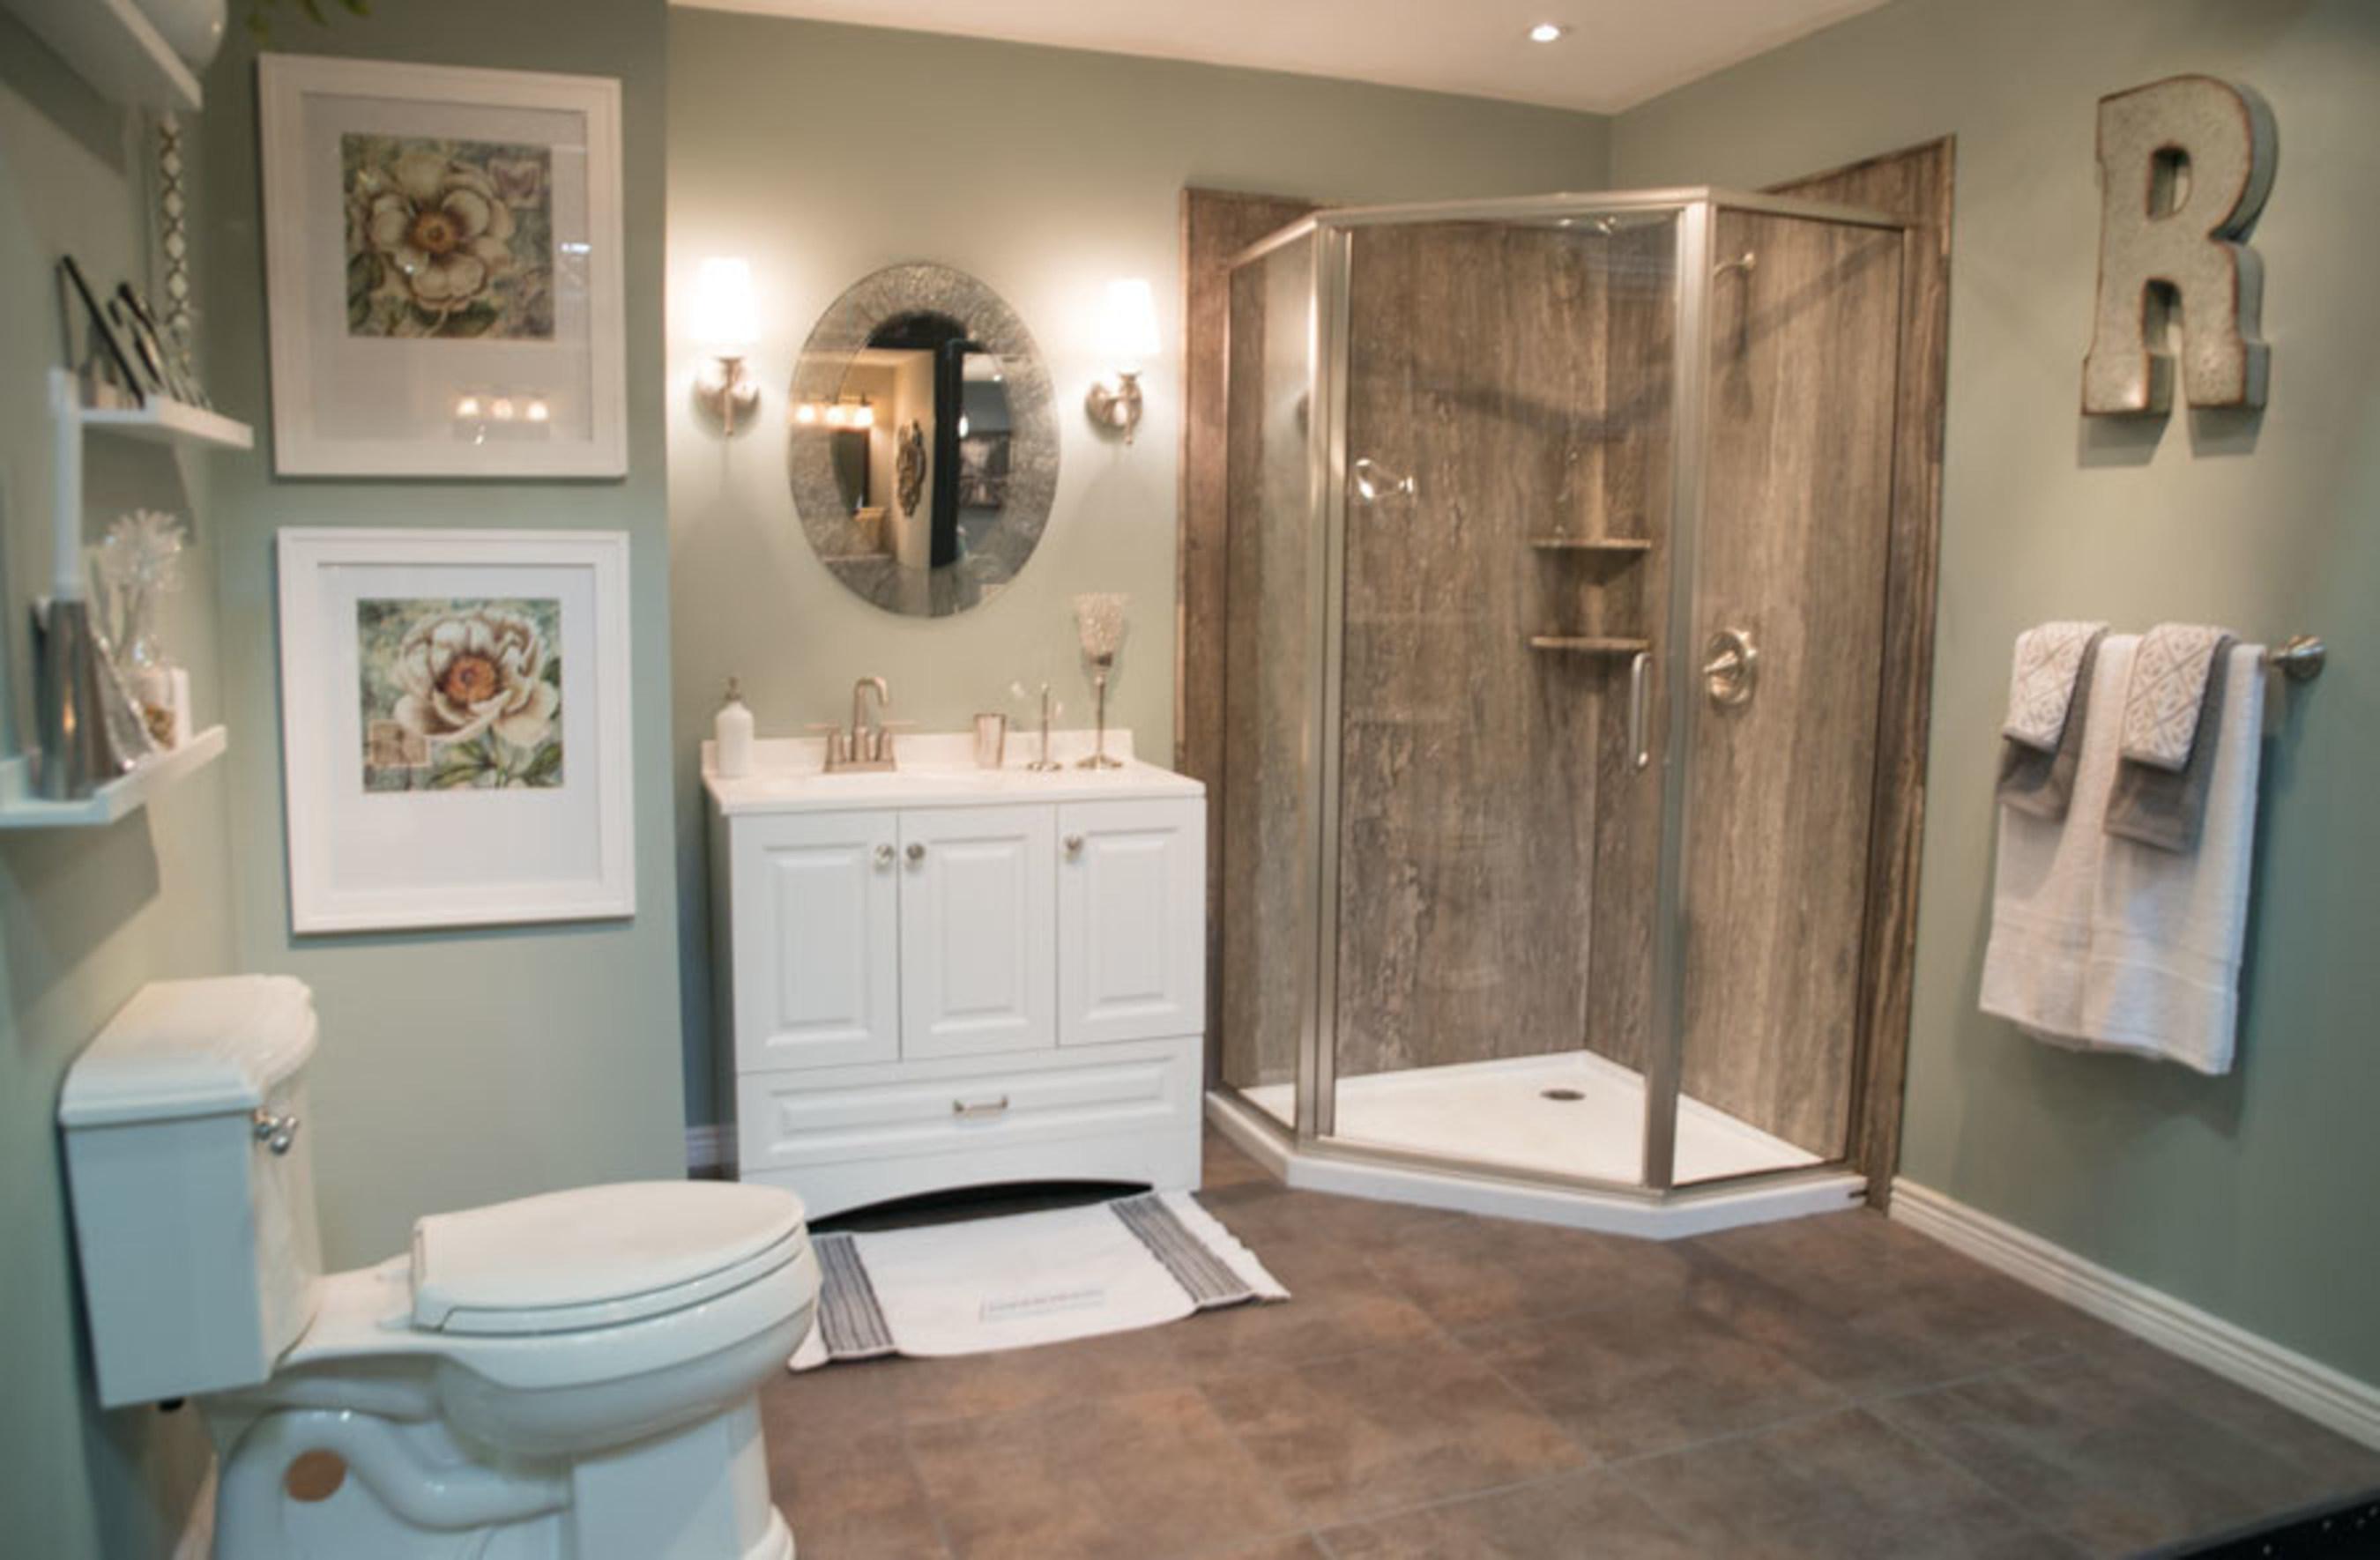 Re-Bath Bathroom Remodeling Franchise Plans Expansion into ... on Restroom Renovation  id=95375